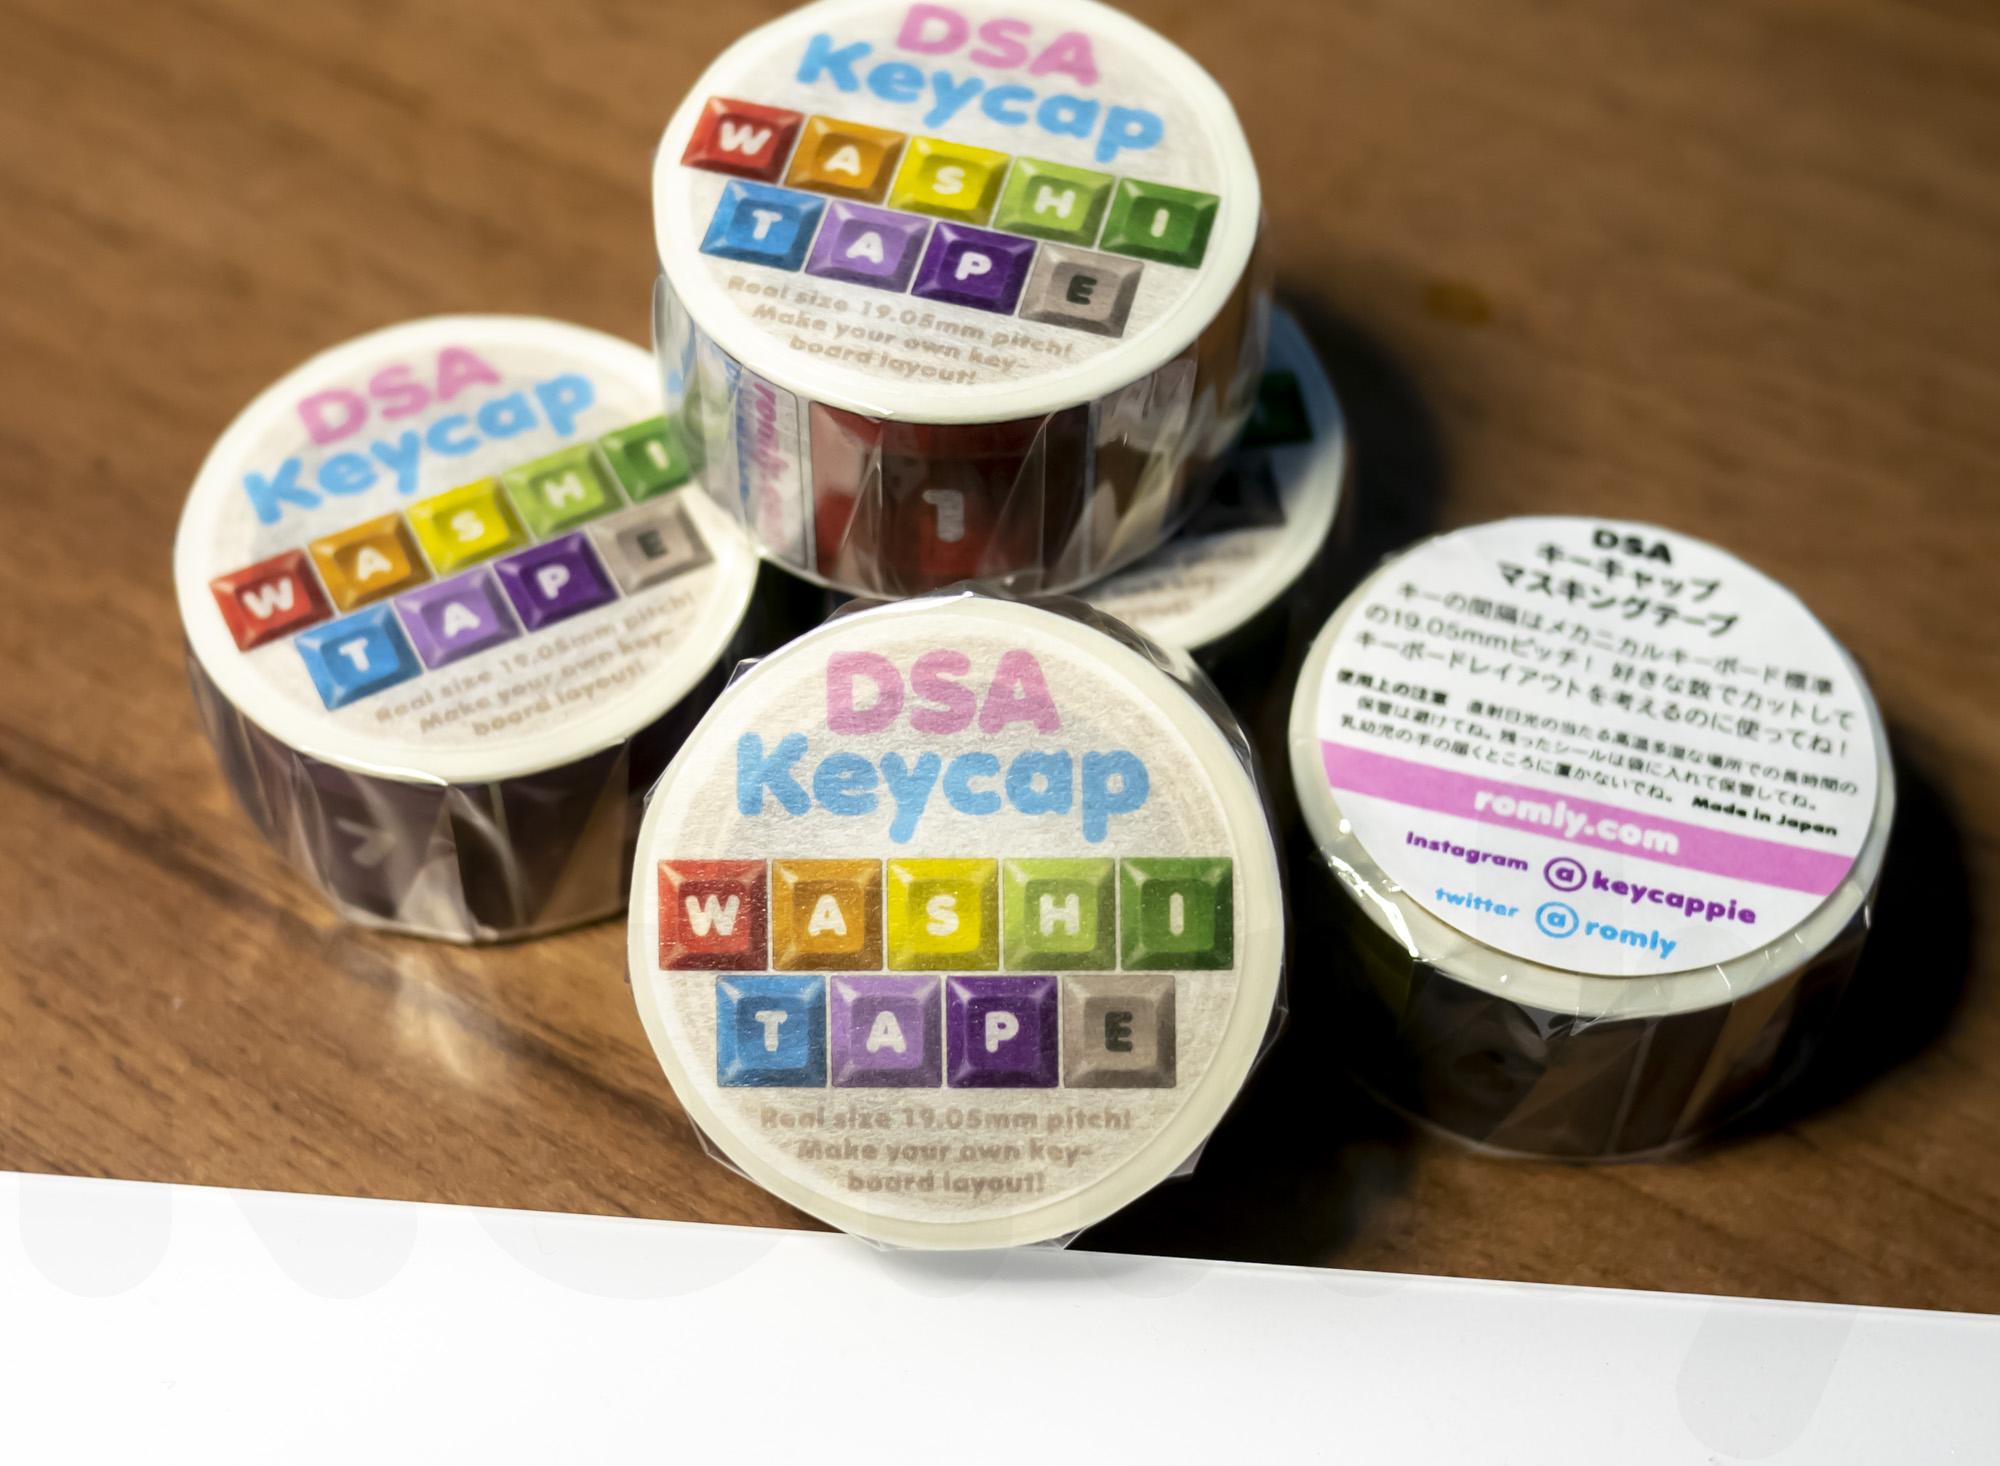 DSA Keycap WashiTape